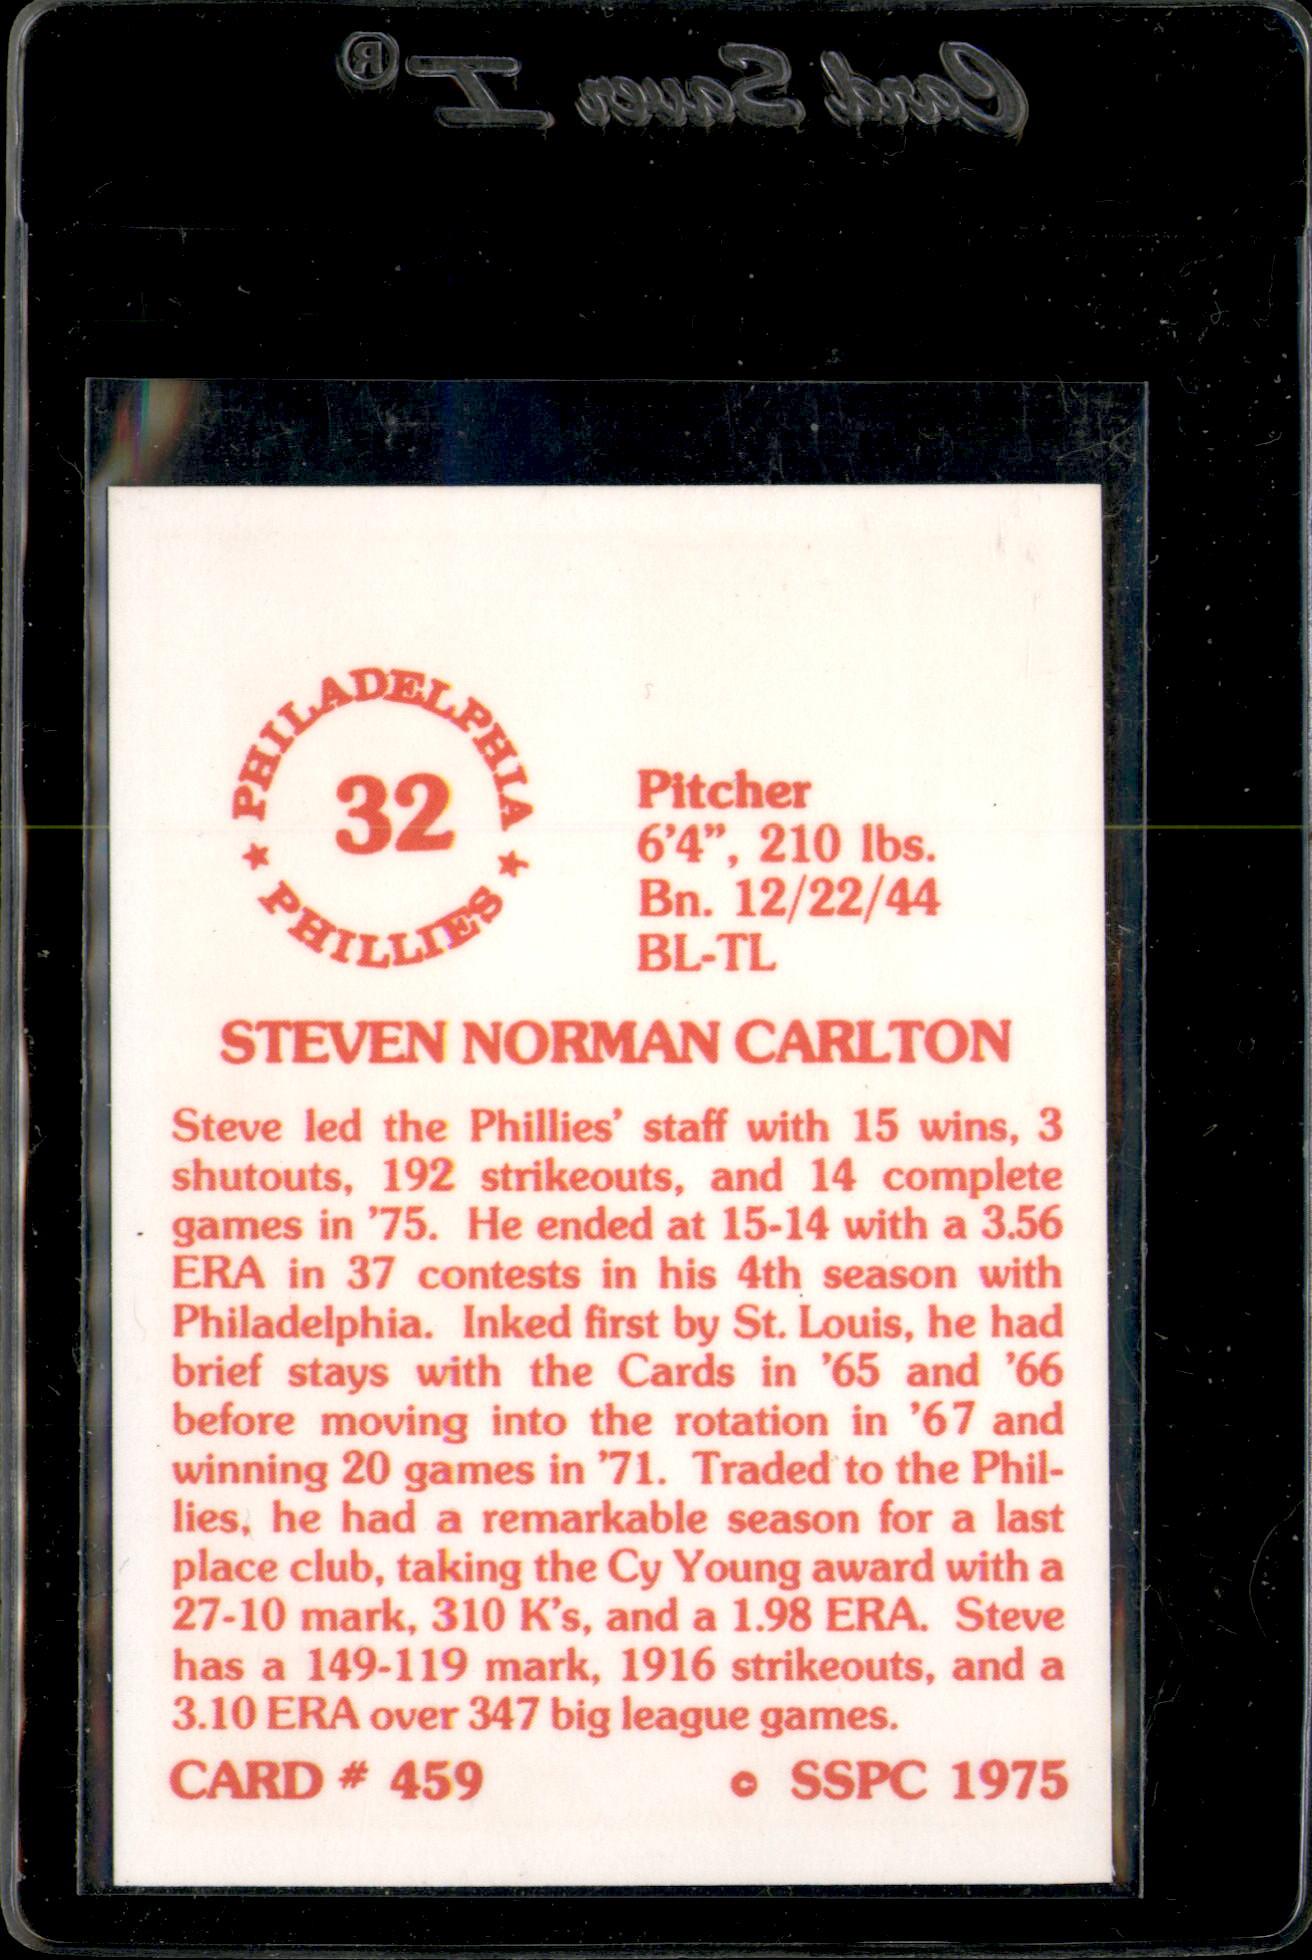 1976 SSPC #459 Steve Carlton back image